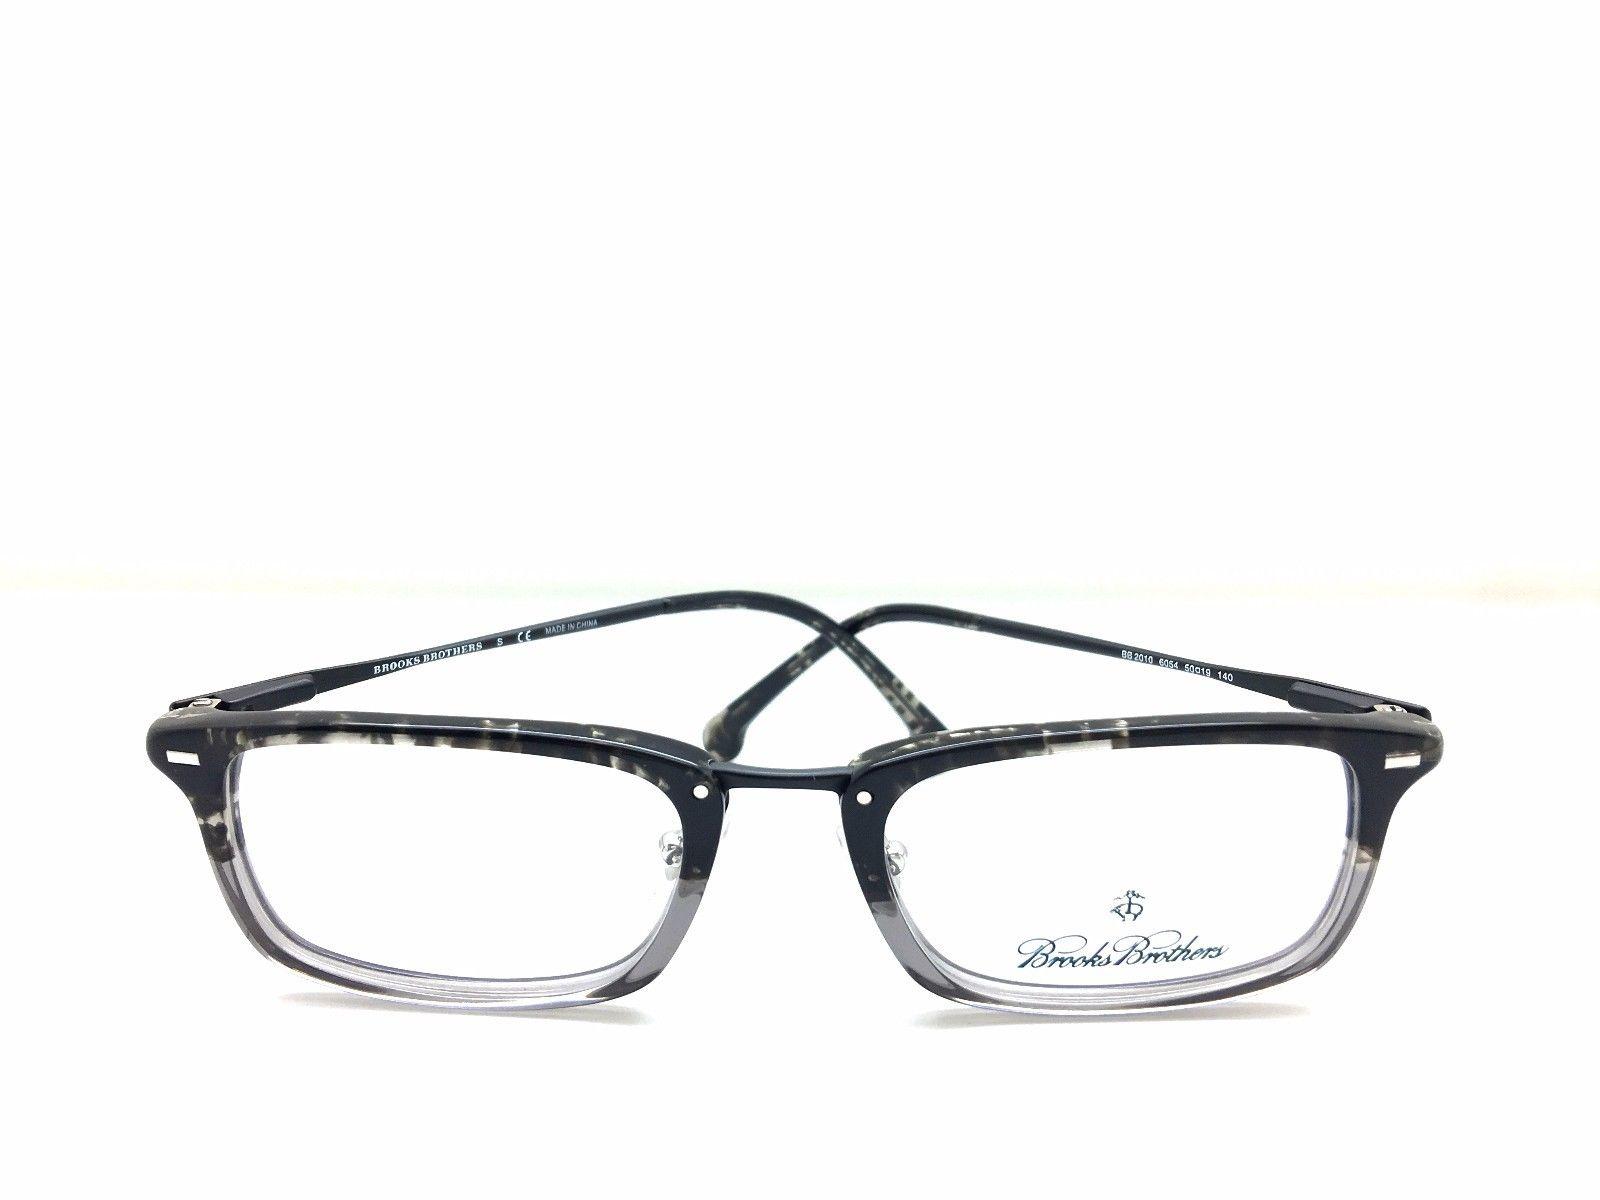 81d39c134d Brooks Brothers BB 2010 6054 Eyeglasses Frames 50mm - 172